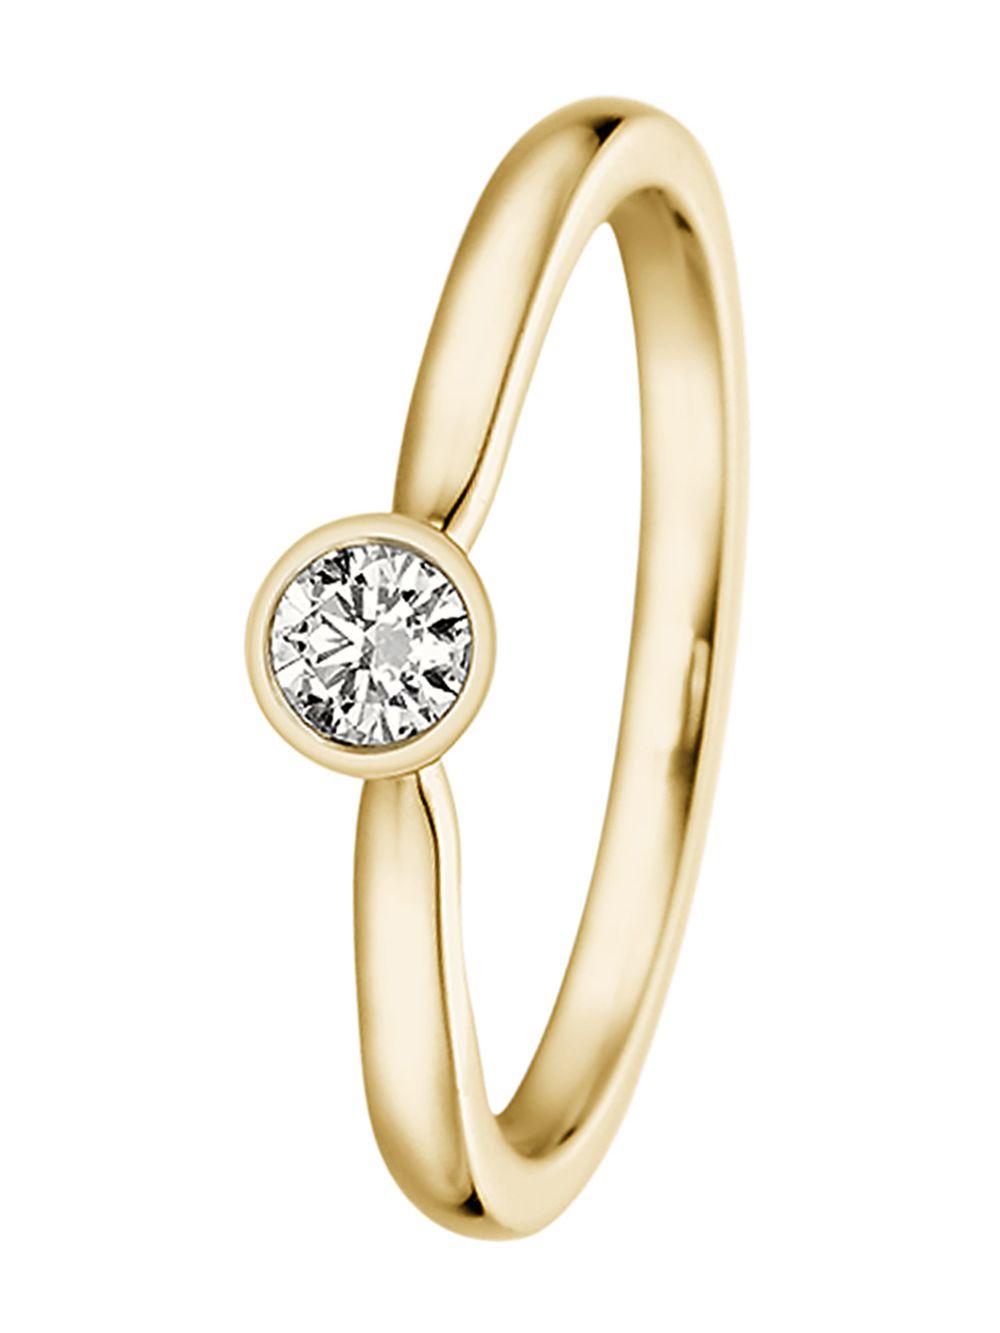 TRENDOR Ladies Ring Gold with Diamond 532494 • uhrcenter